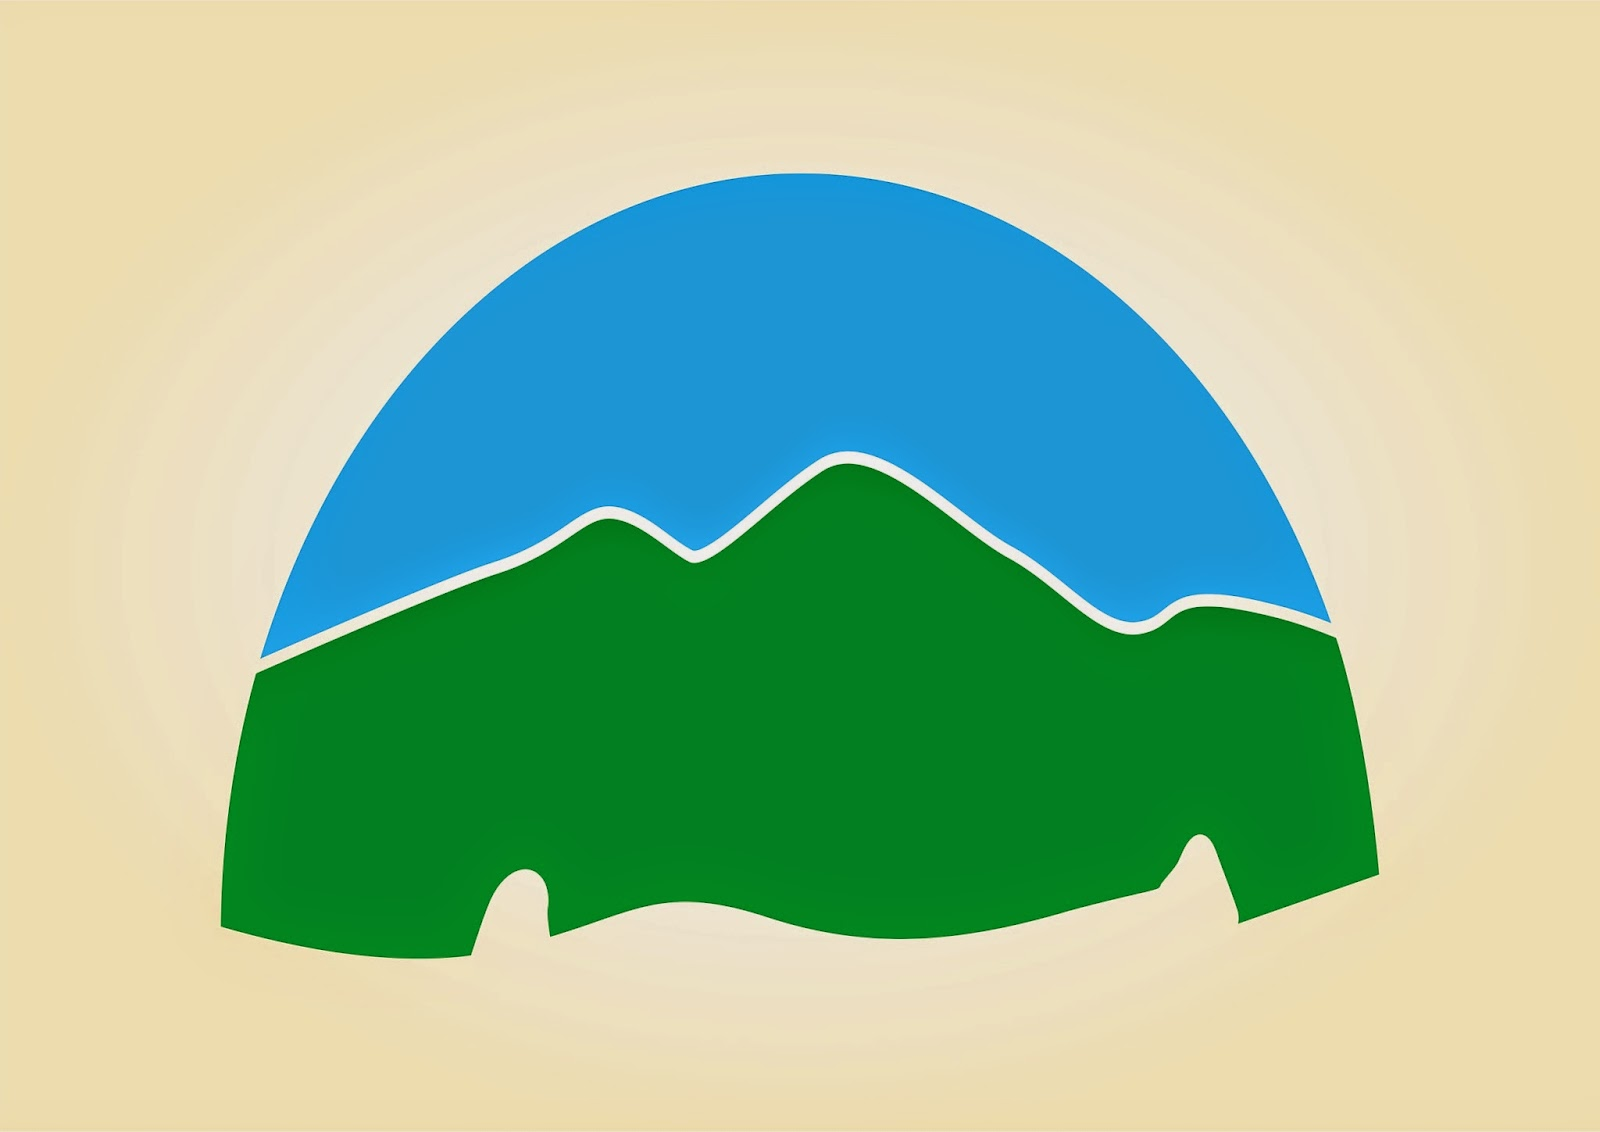 Arti  Makna LogoLambang Polda Papua Barat  Logo Lambang